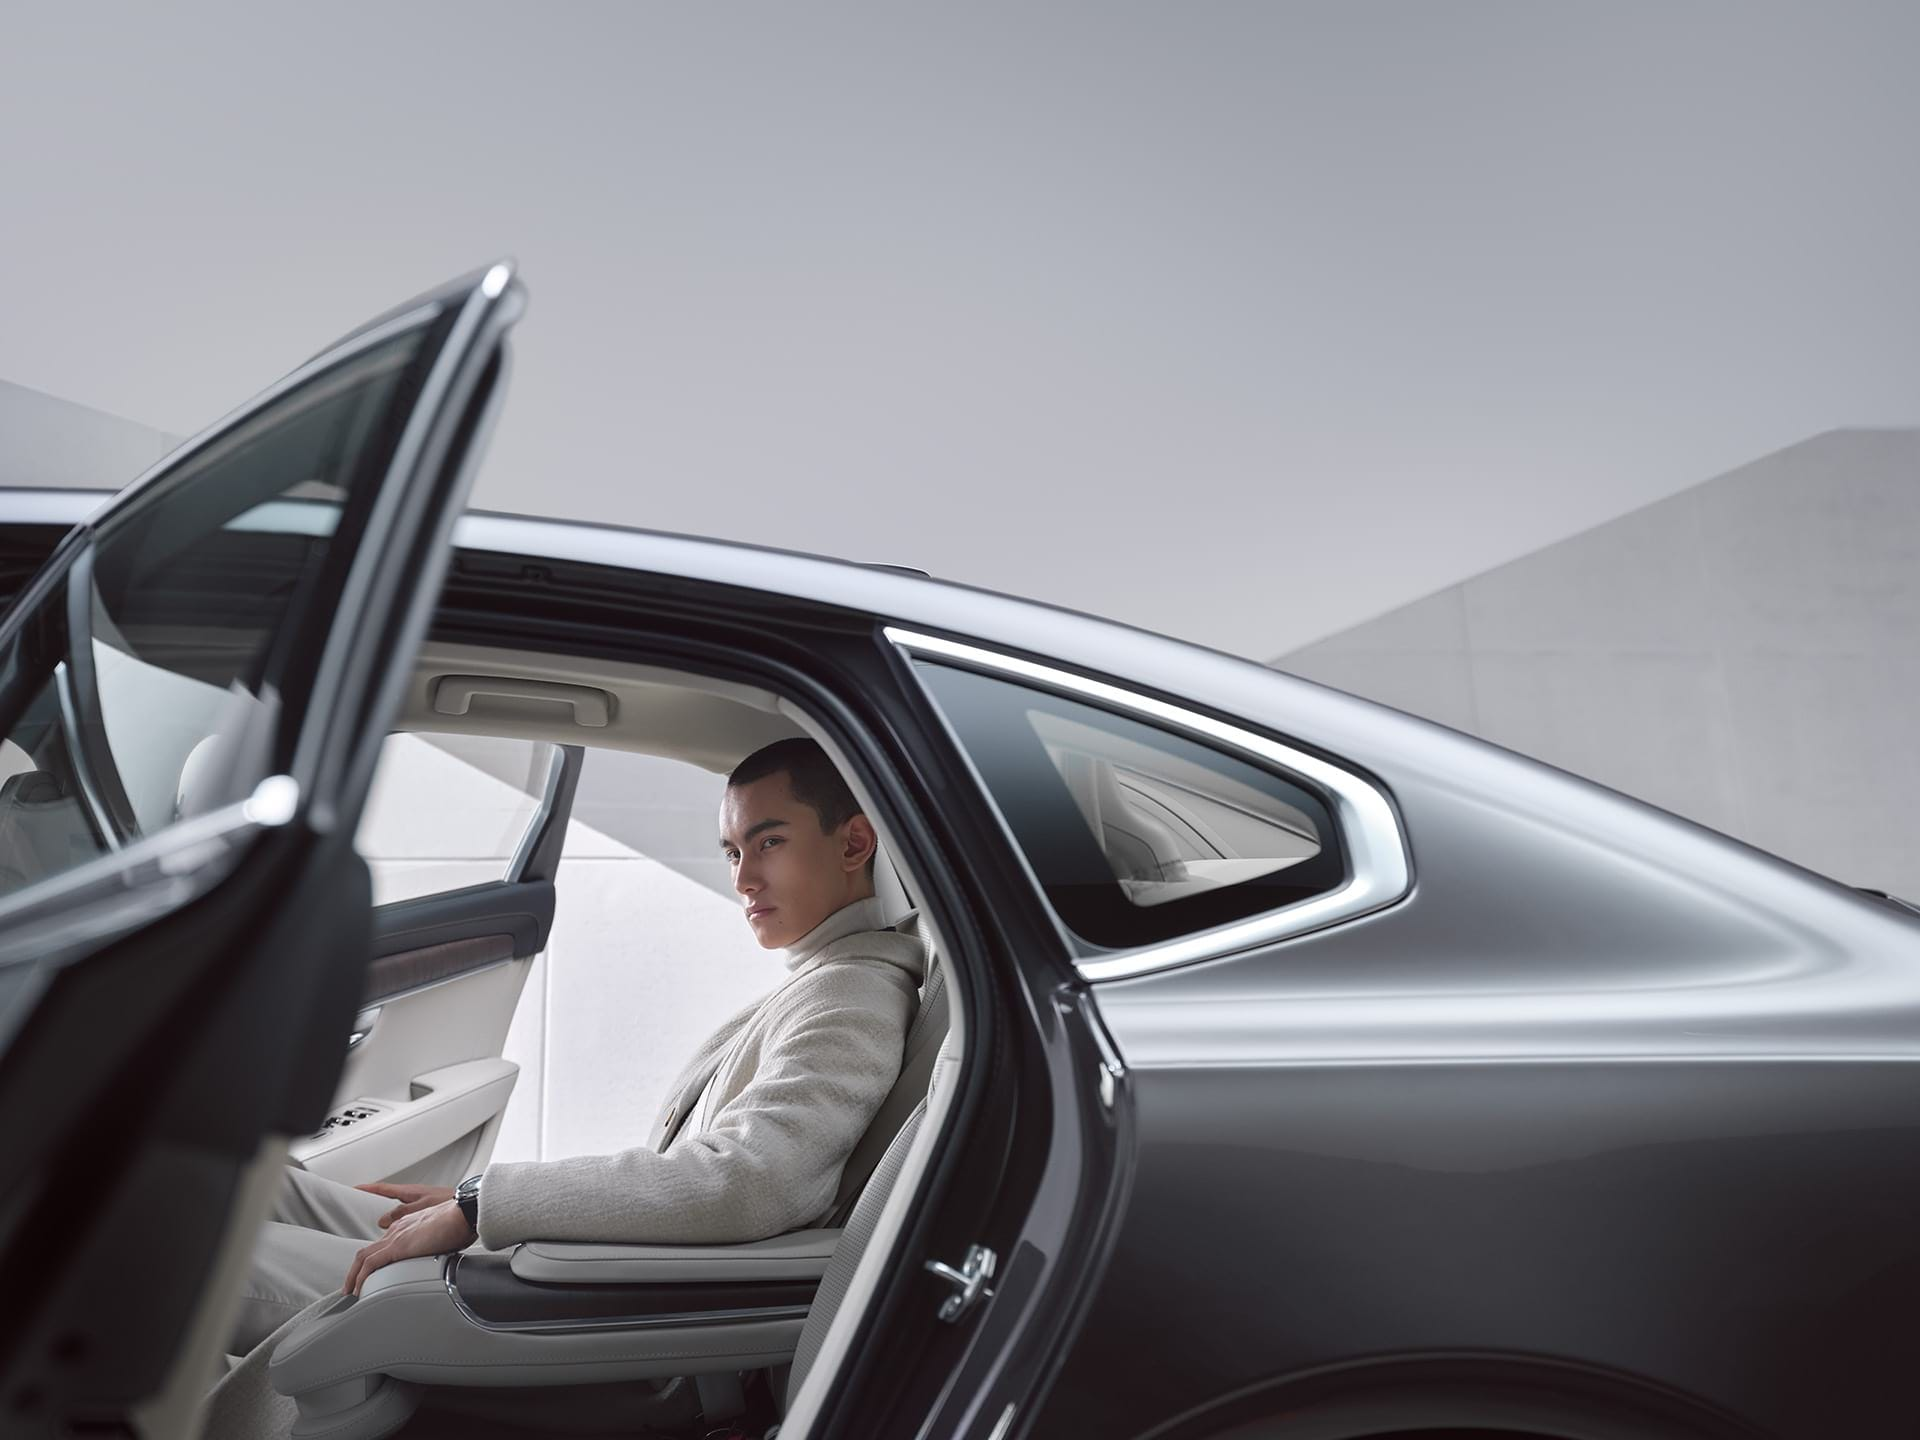 Muškarac sedi na zadnjem sedištu automobila.